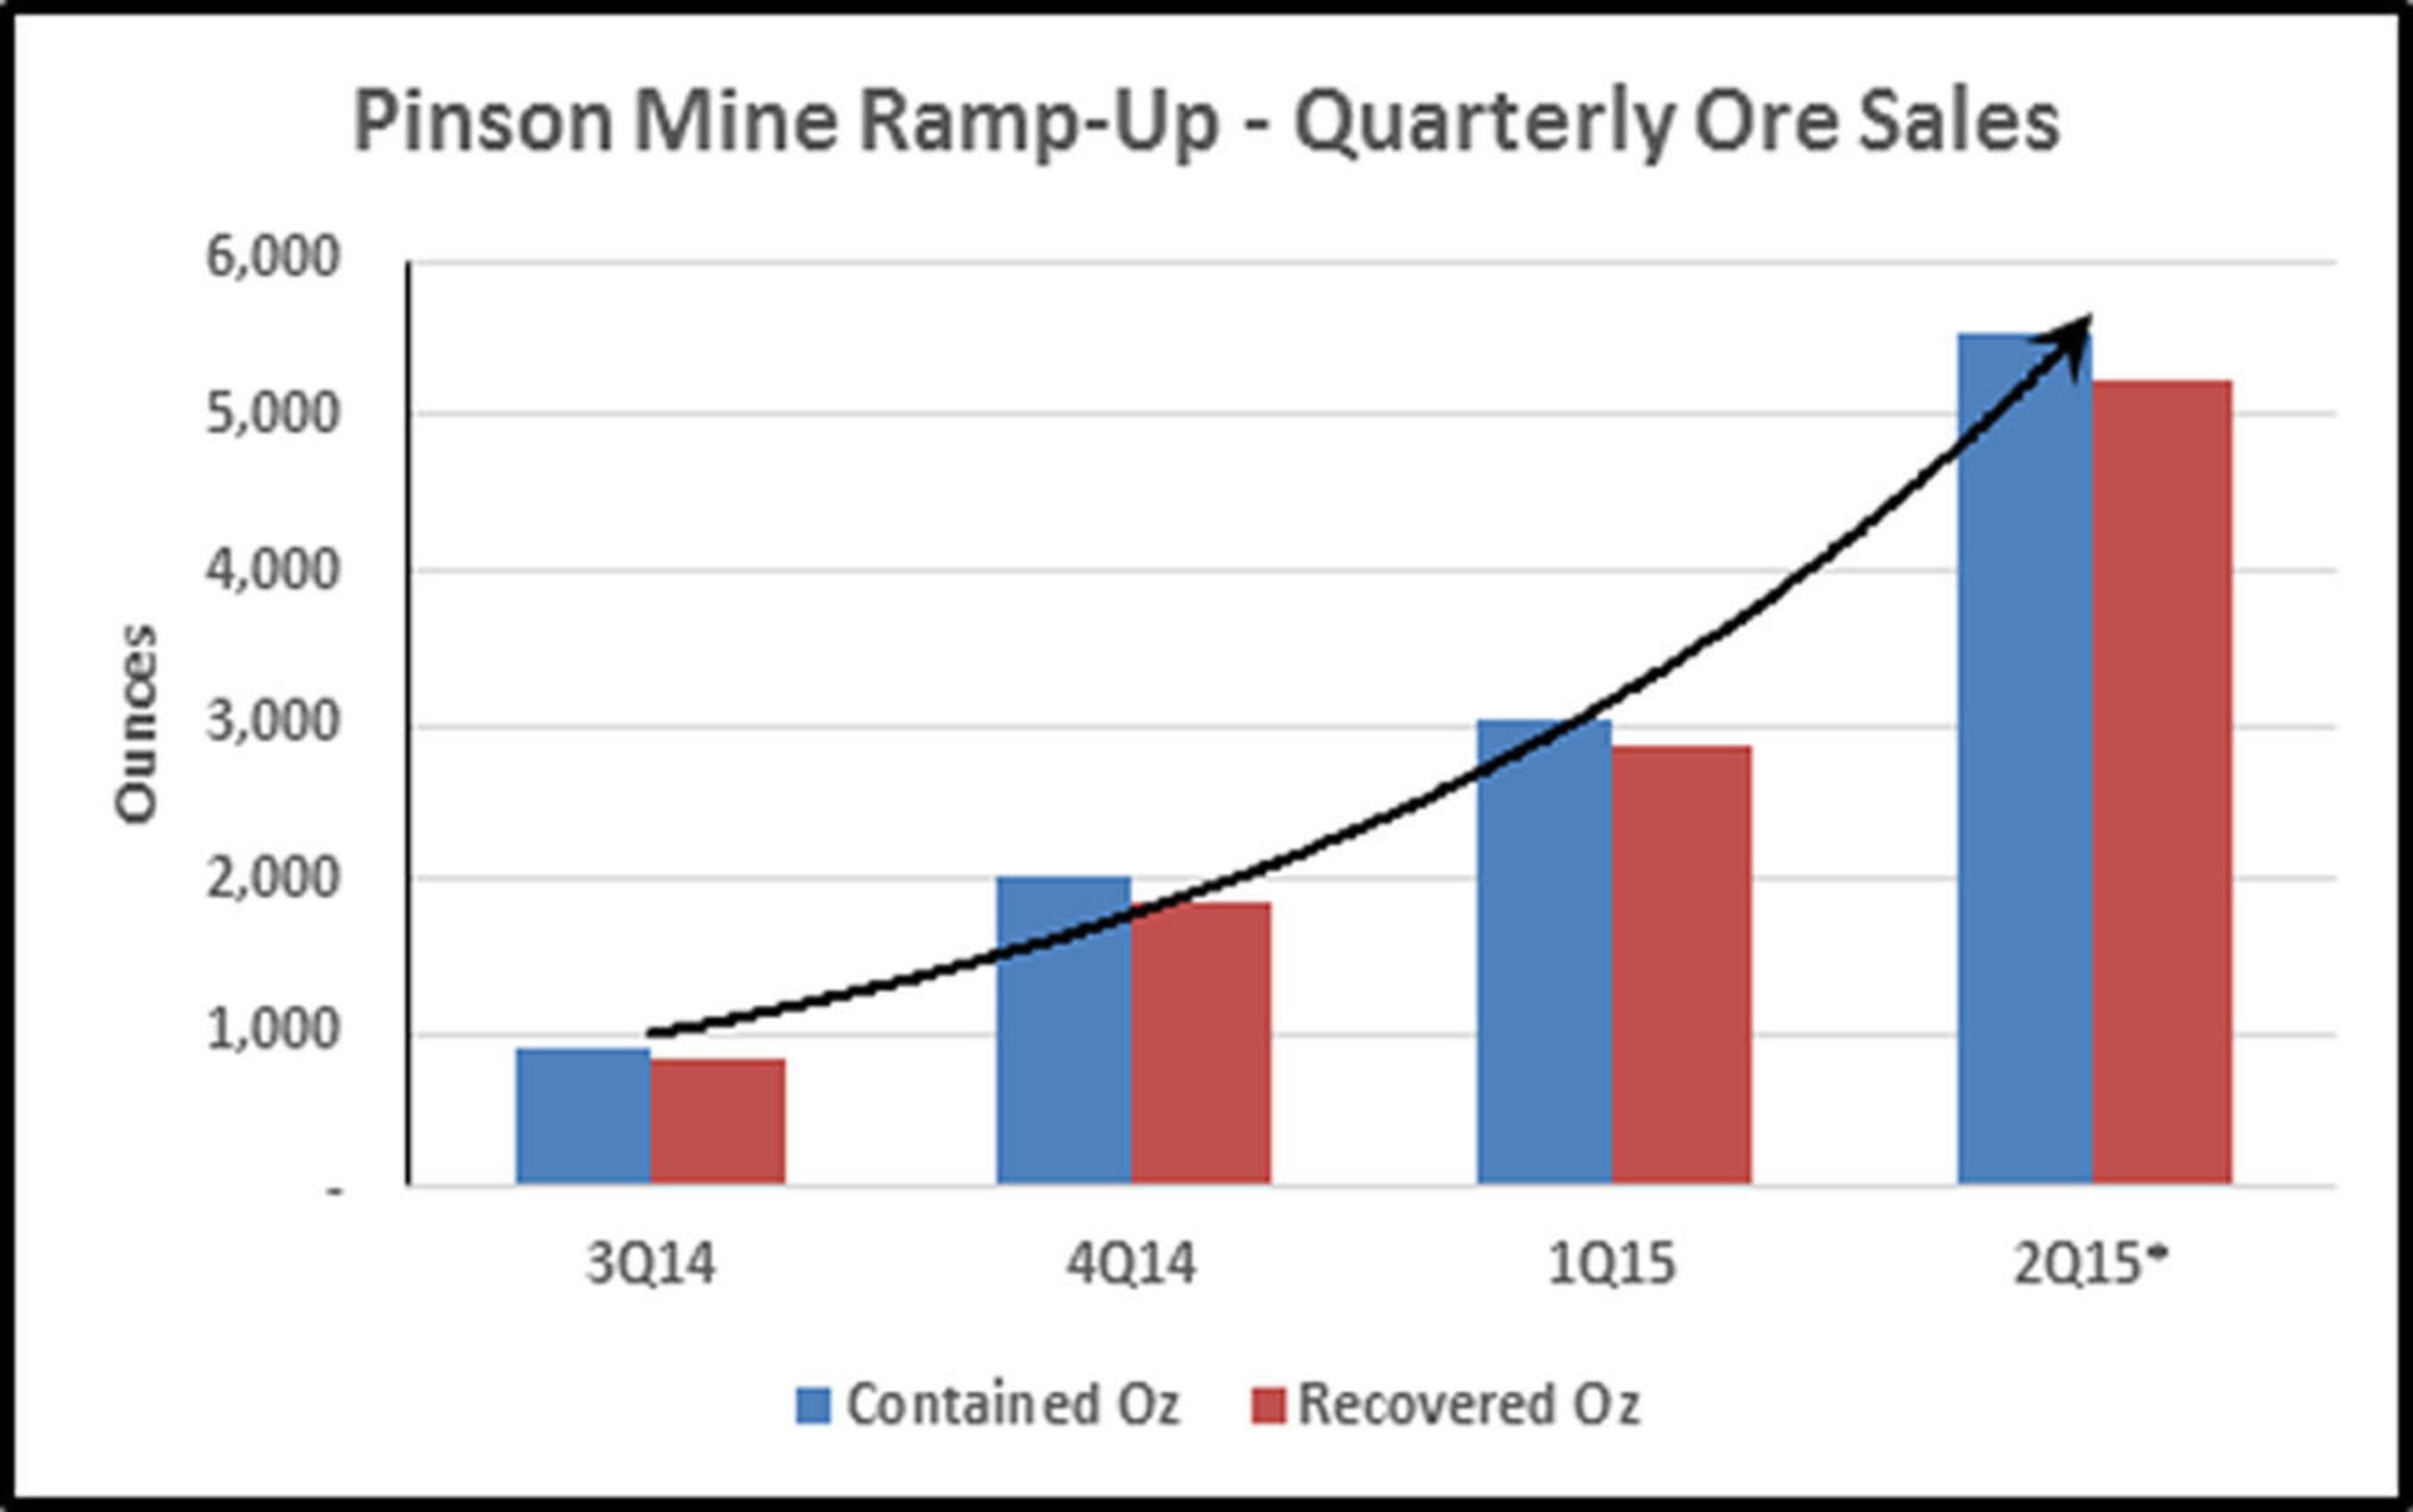 Pinson Mine Ramp-Up - Quarterly Ore Sales